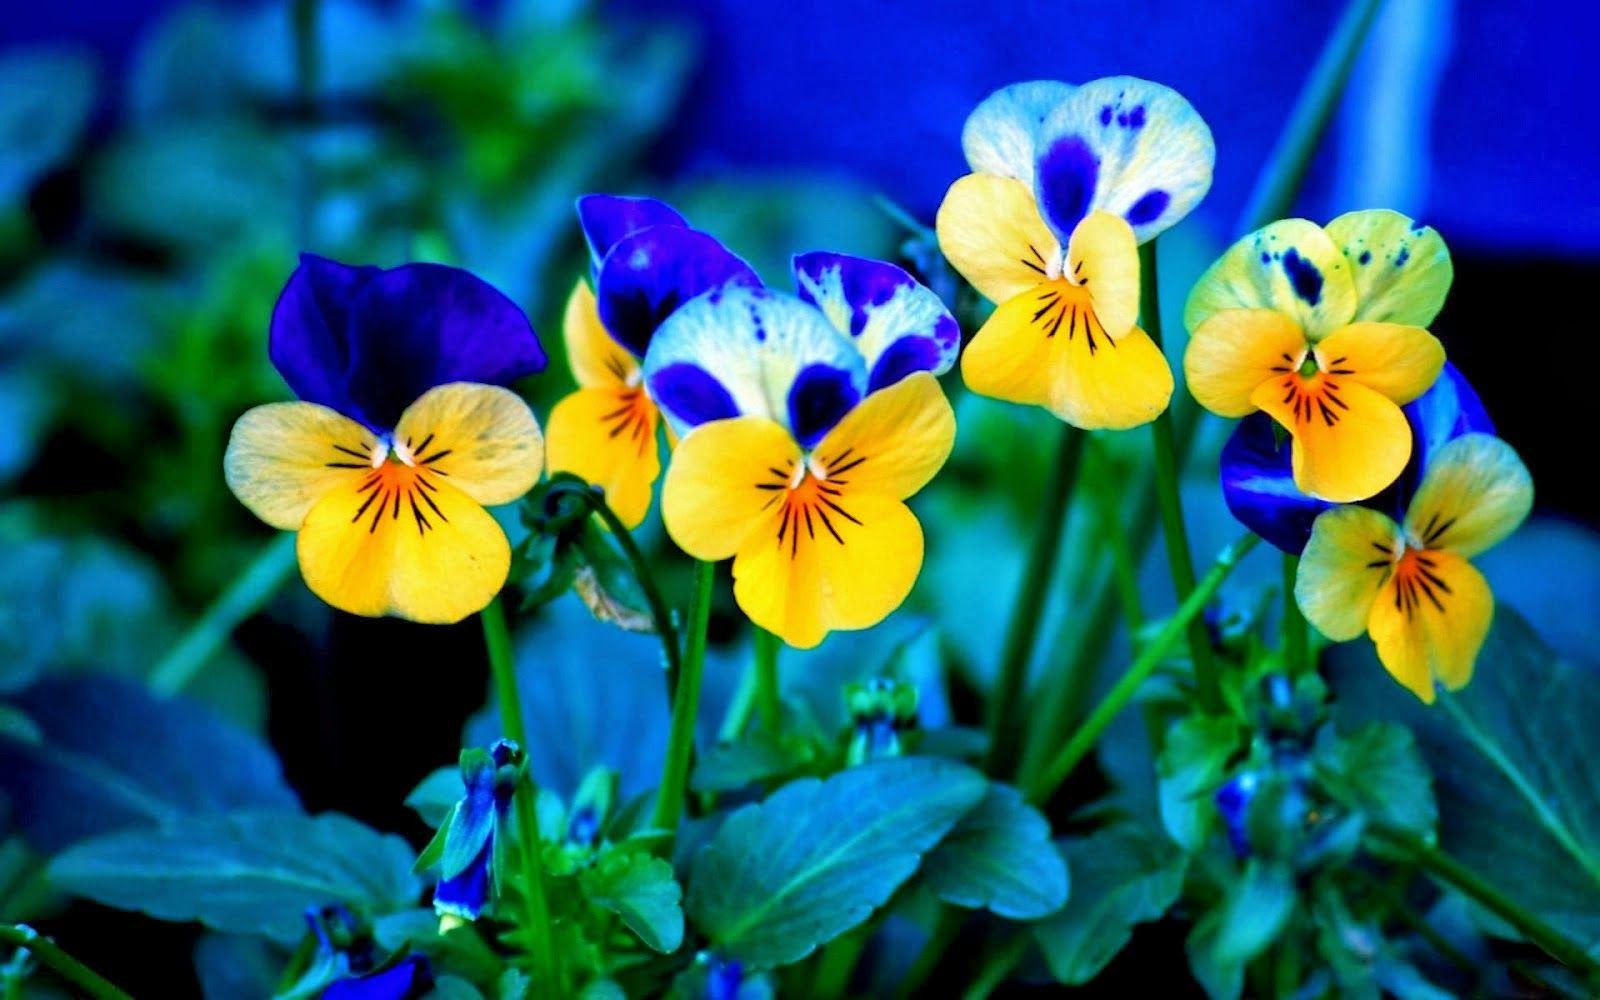 Download 76 Wallpaper Bunga Terindah Untuk Handphone Pansies Flowers Spring Flowers Wallpaper Pansies